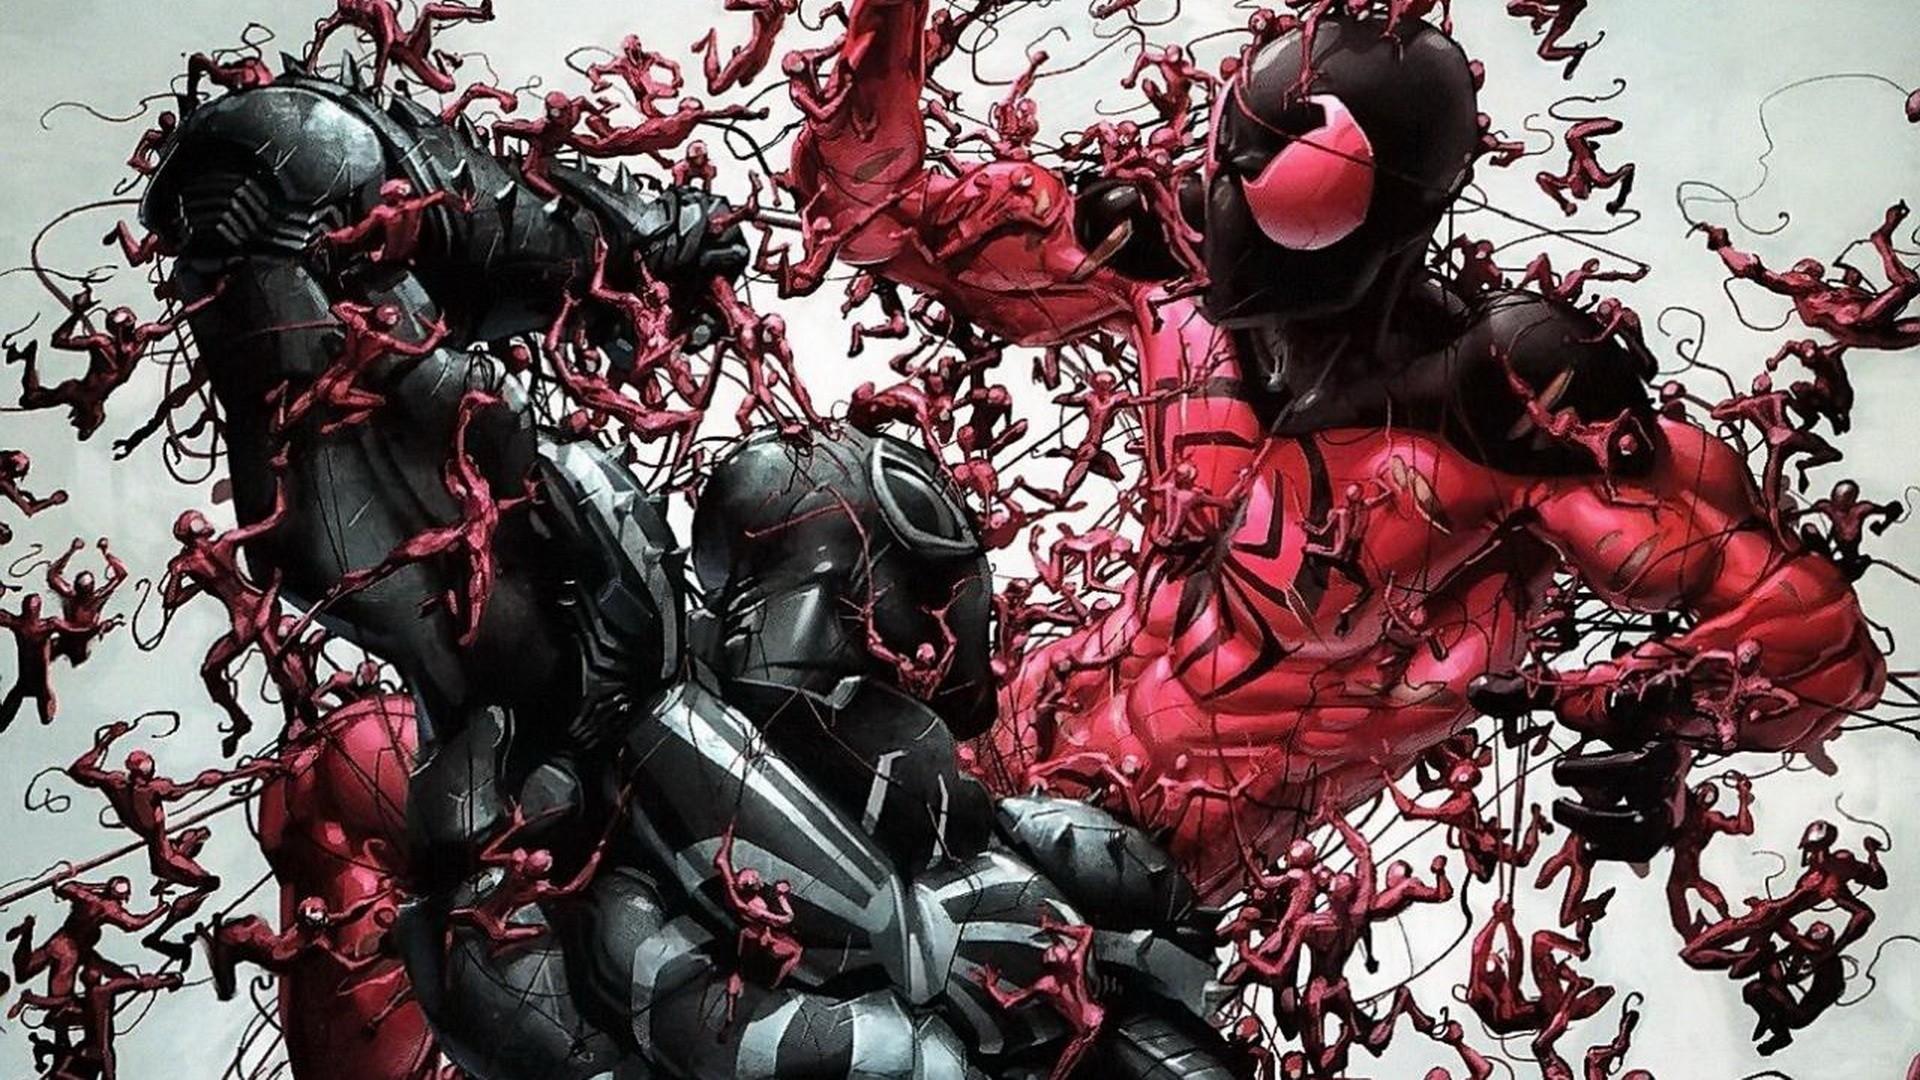 Venom Wallpapers Pictures Images: Venom Band HD Wallpaper ·① WallpaperTag